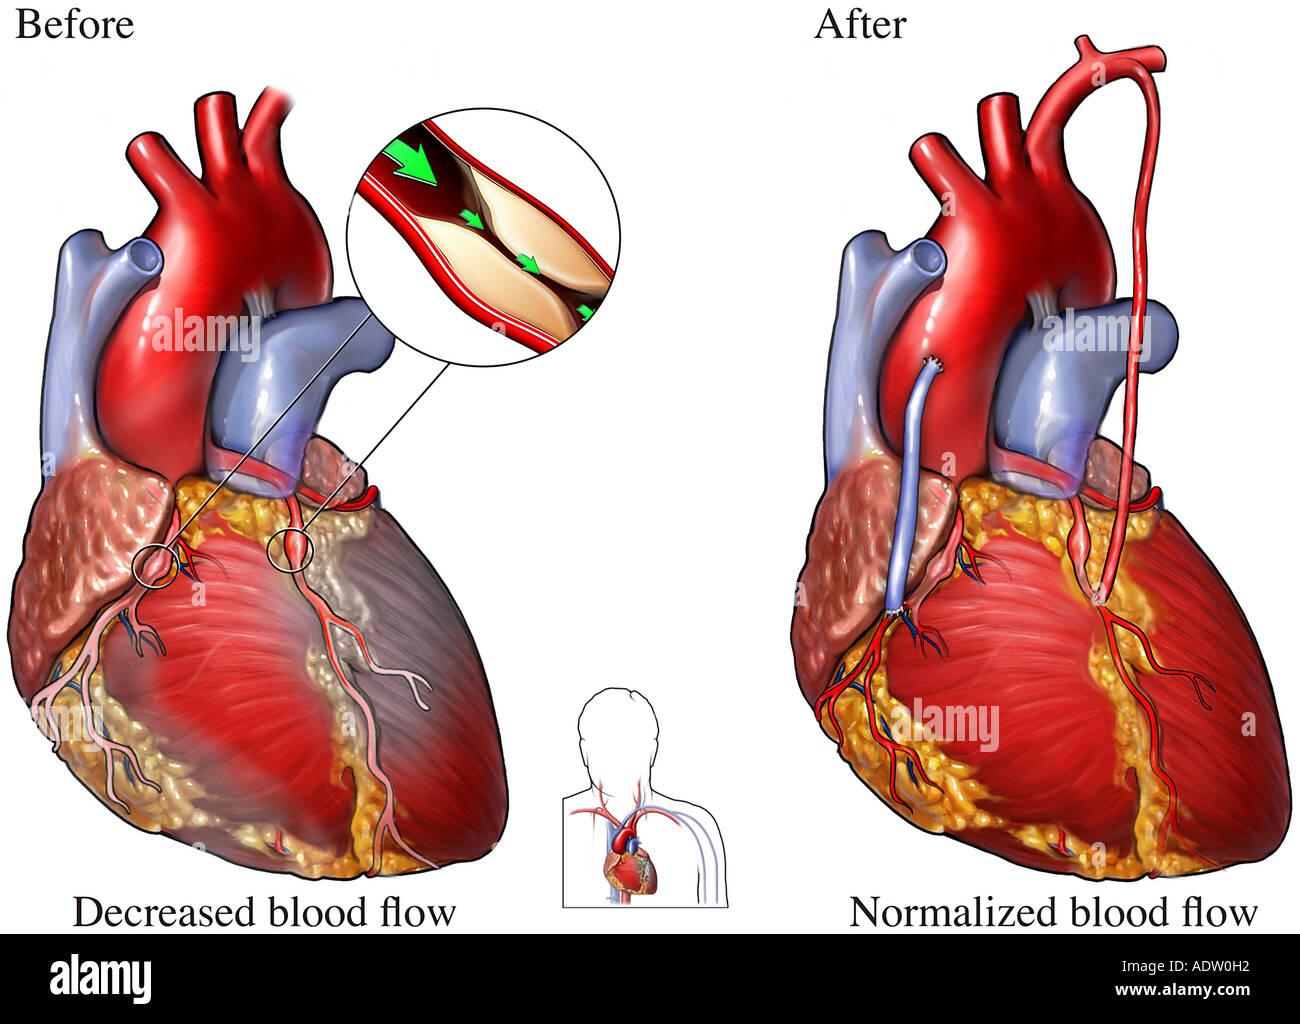 Coronary Artery Disease - Heart Bypass Surgery Stock Photo: 7710993 ...